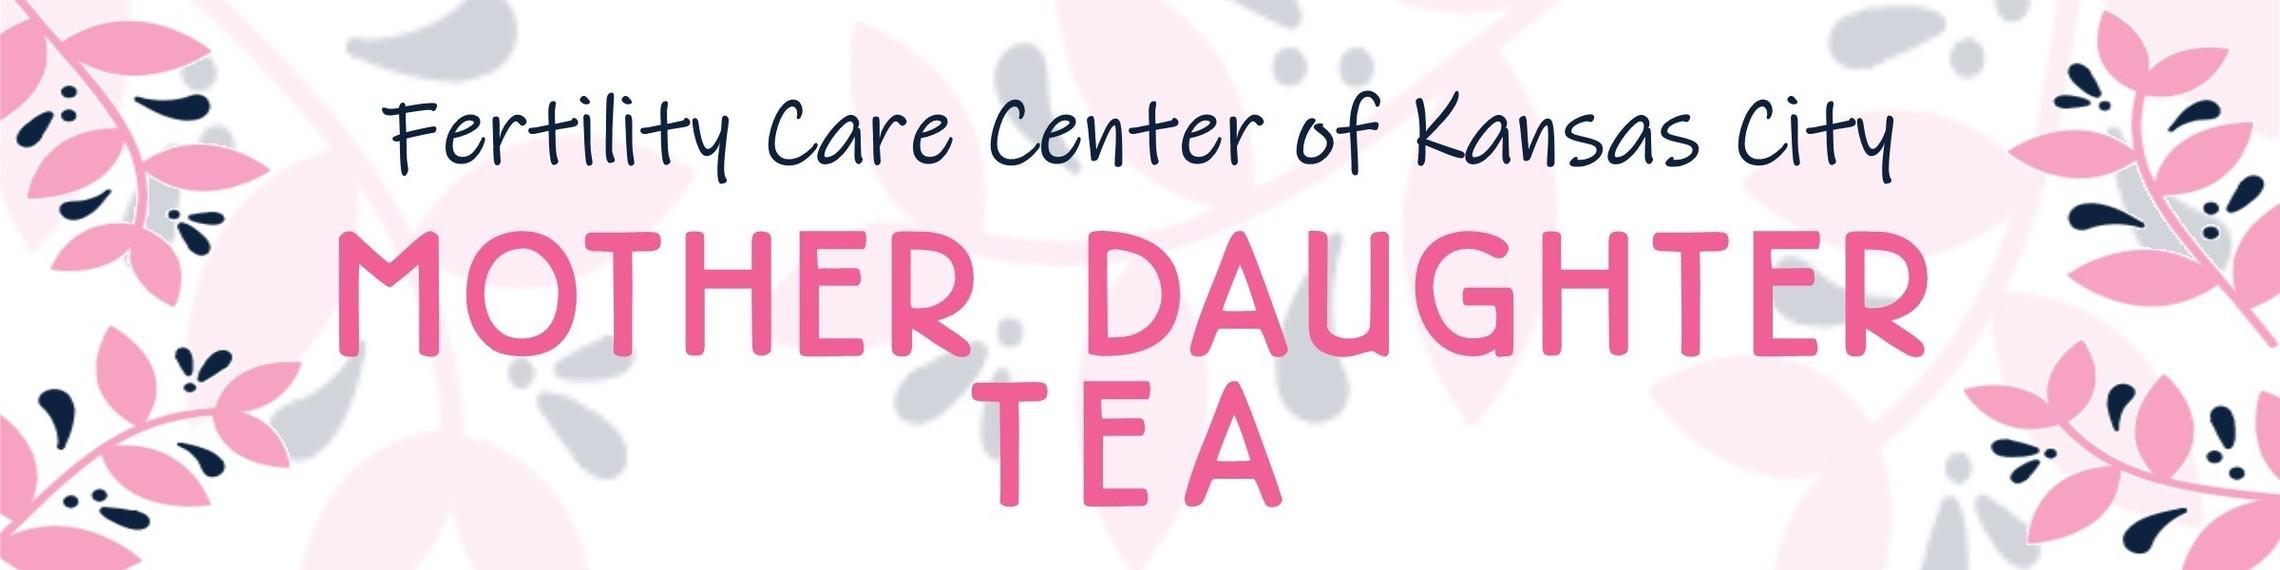 Mother Daughter Tea